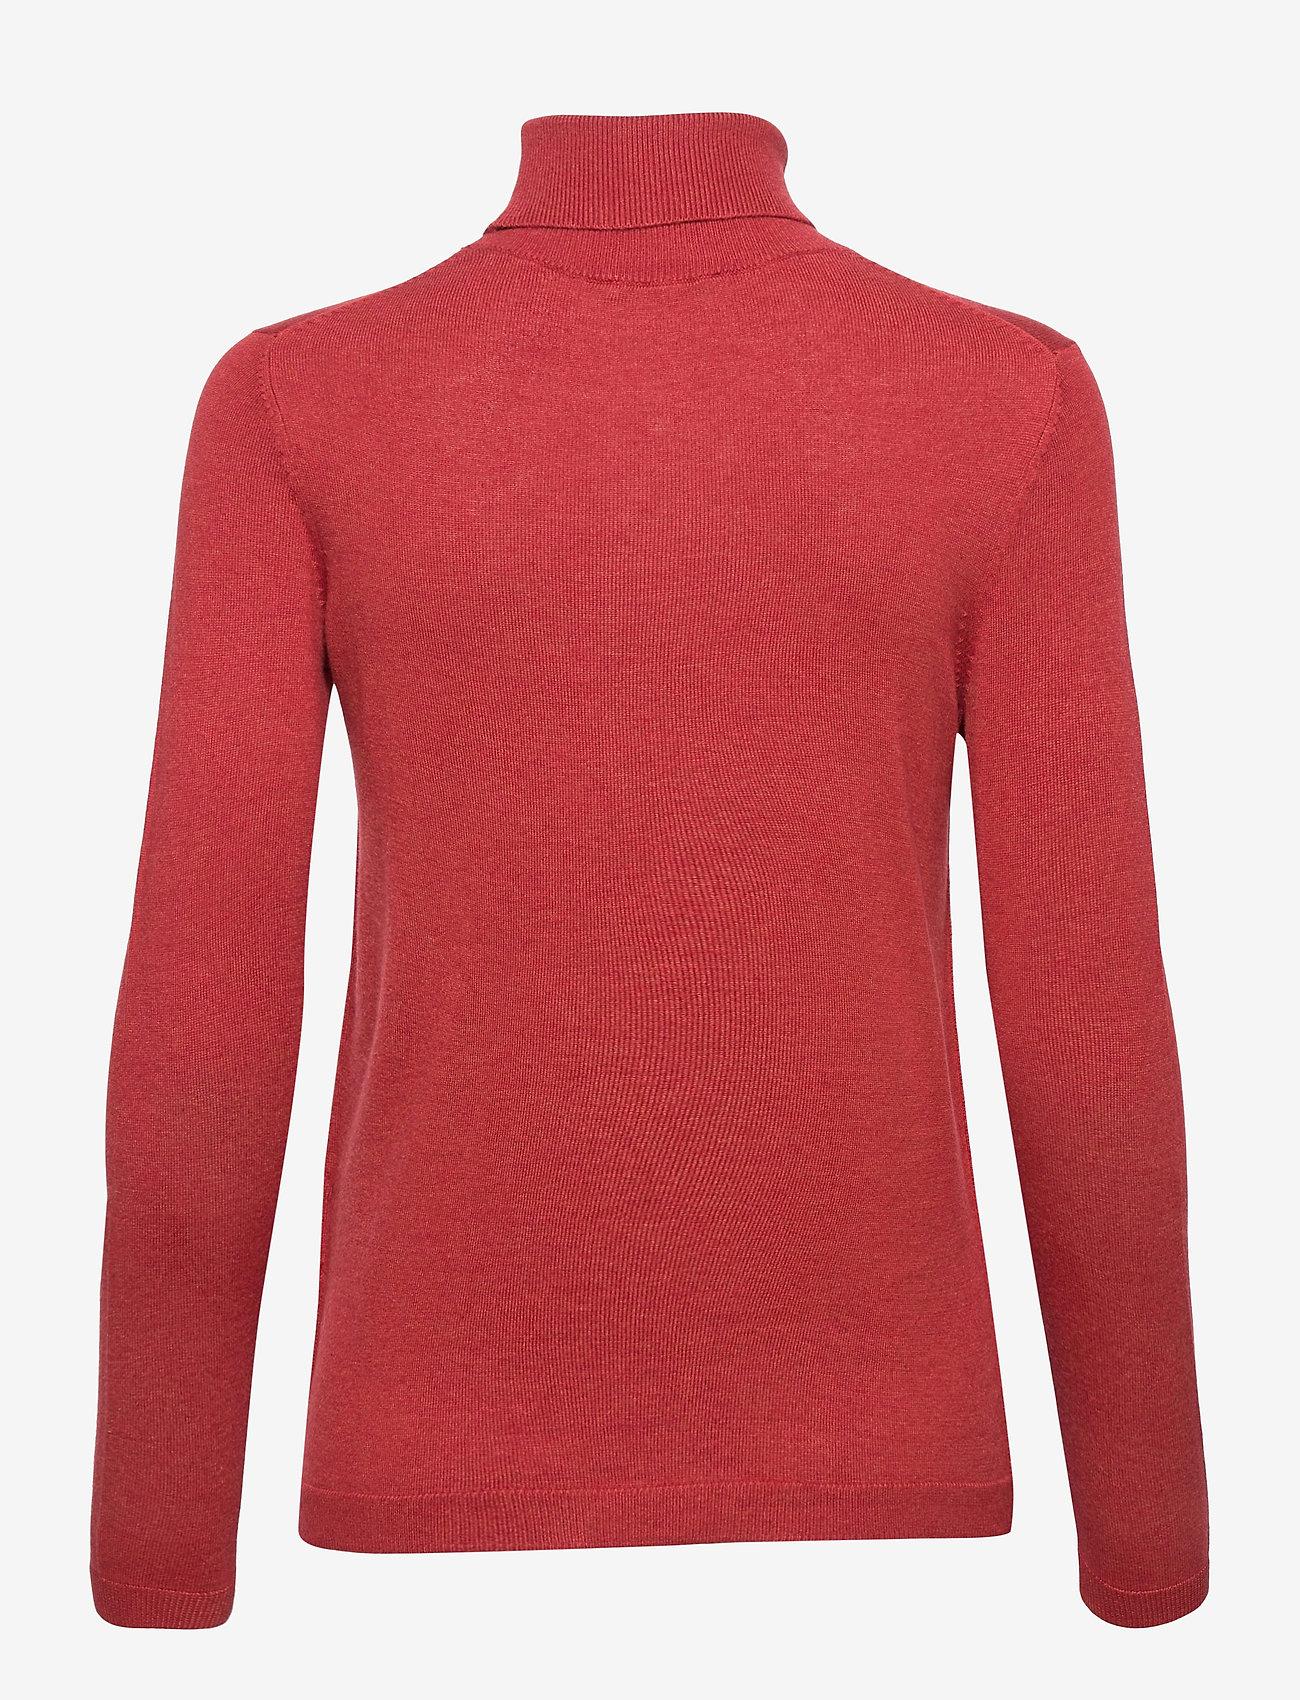 EDC by Esprit - Sweaters - turtlenecks - terracotta 5 - 1